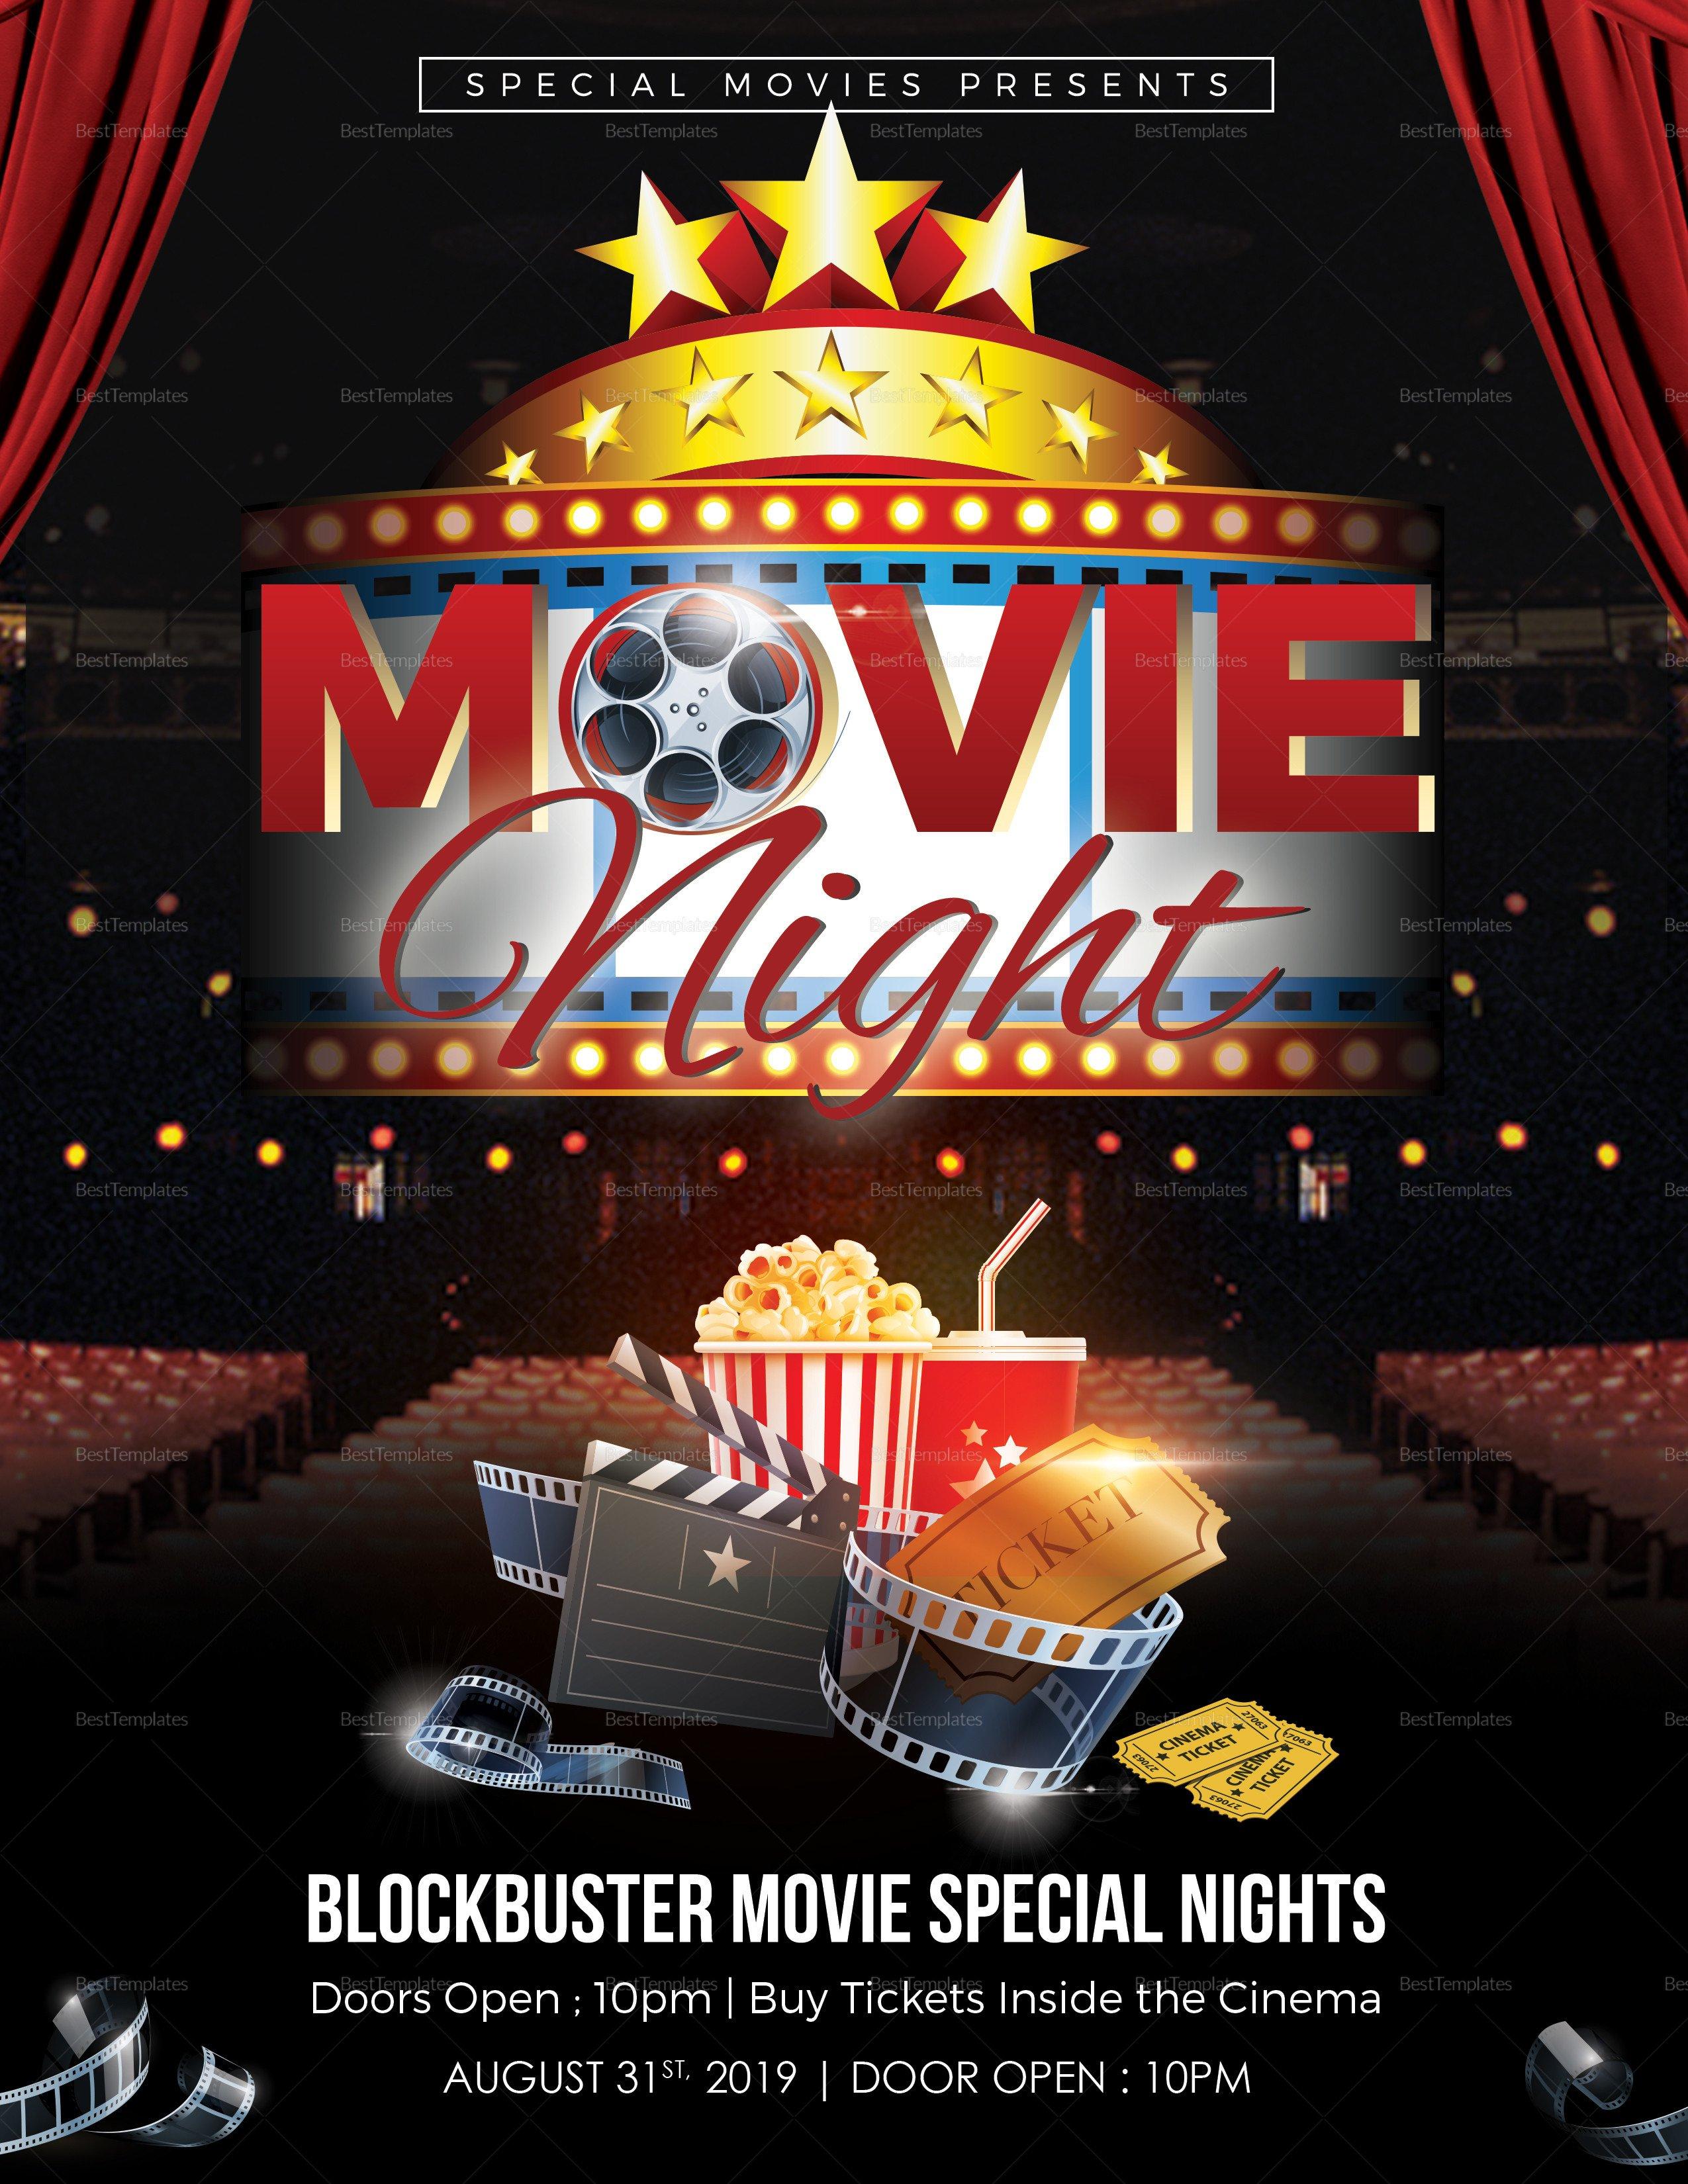 Free Movie Night Flyer Template Printable Movie Night Flyer Design Template In Word Psd